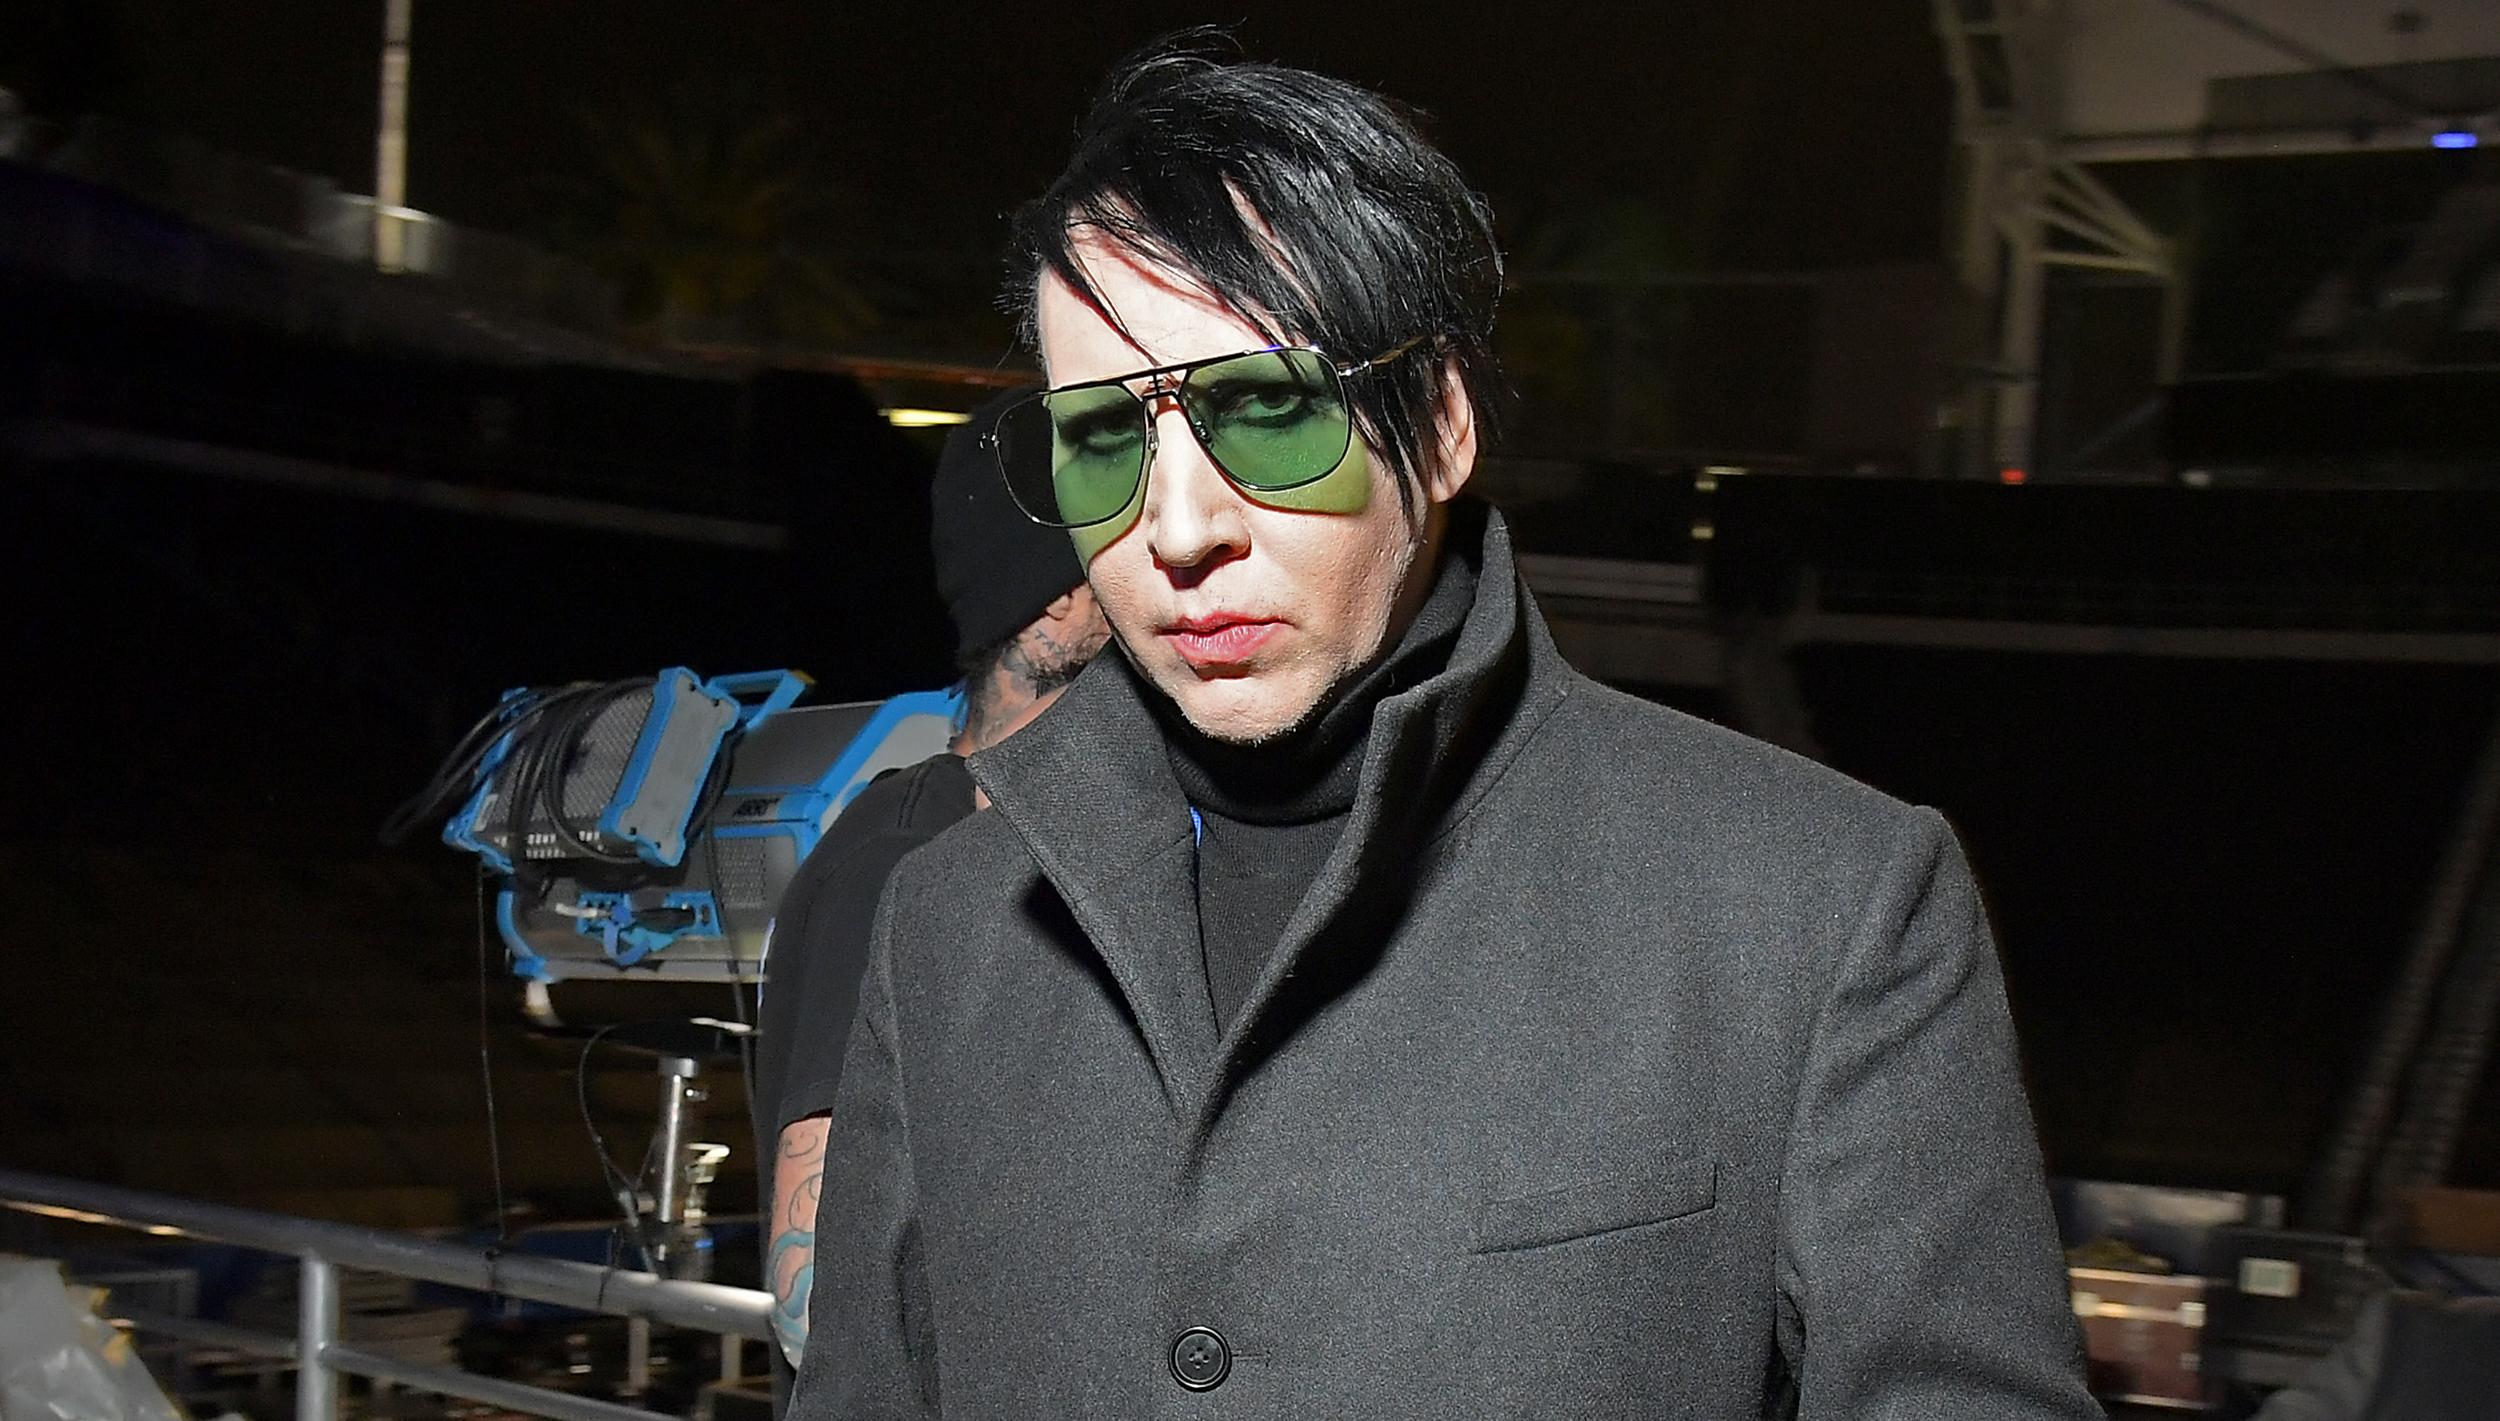 Judge dismisses ex-girlfriend's lawsuit against Marilyn Manson